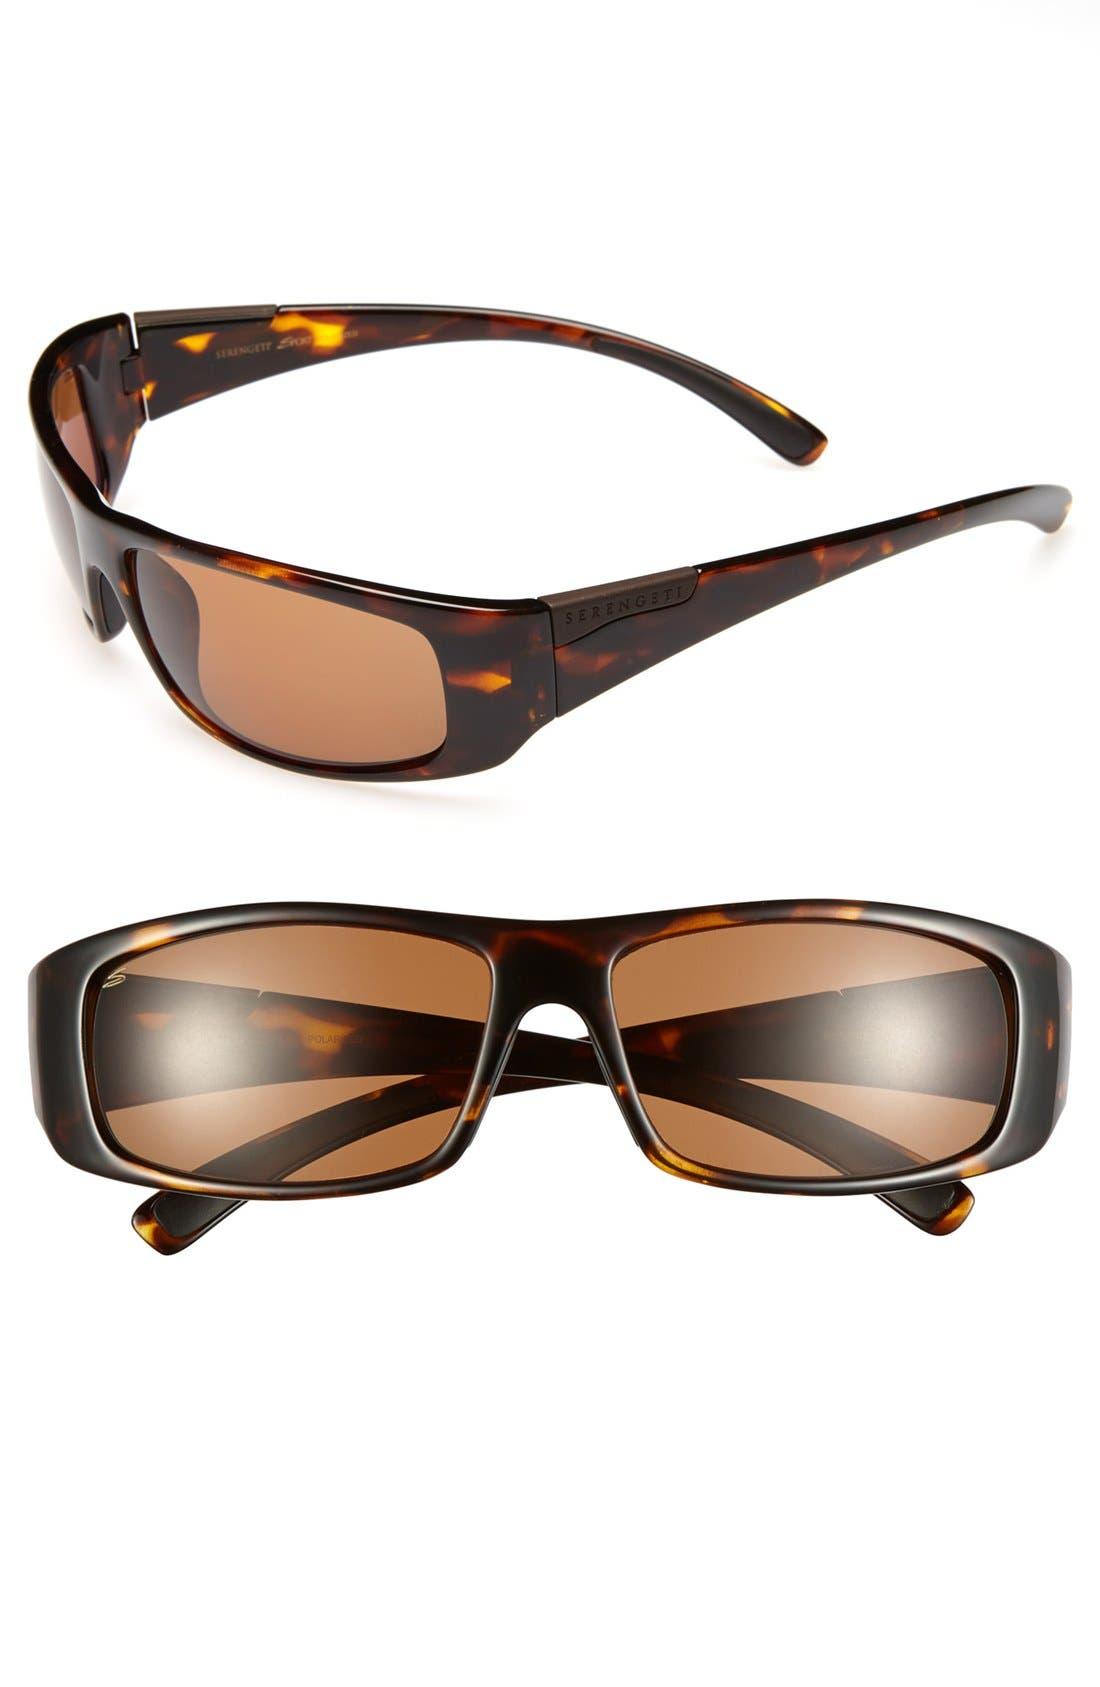 Alternate Image 1 Selected - Serengeti 'Fasano' 65mm Polarized Sunglasses